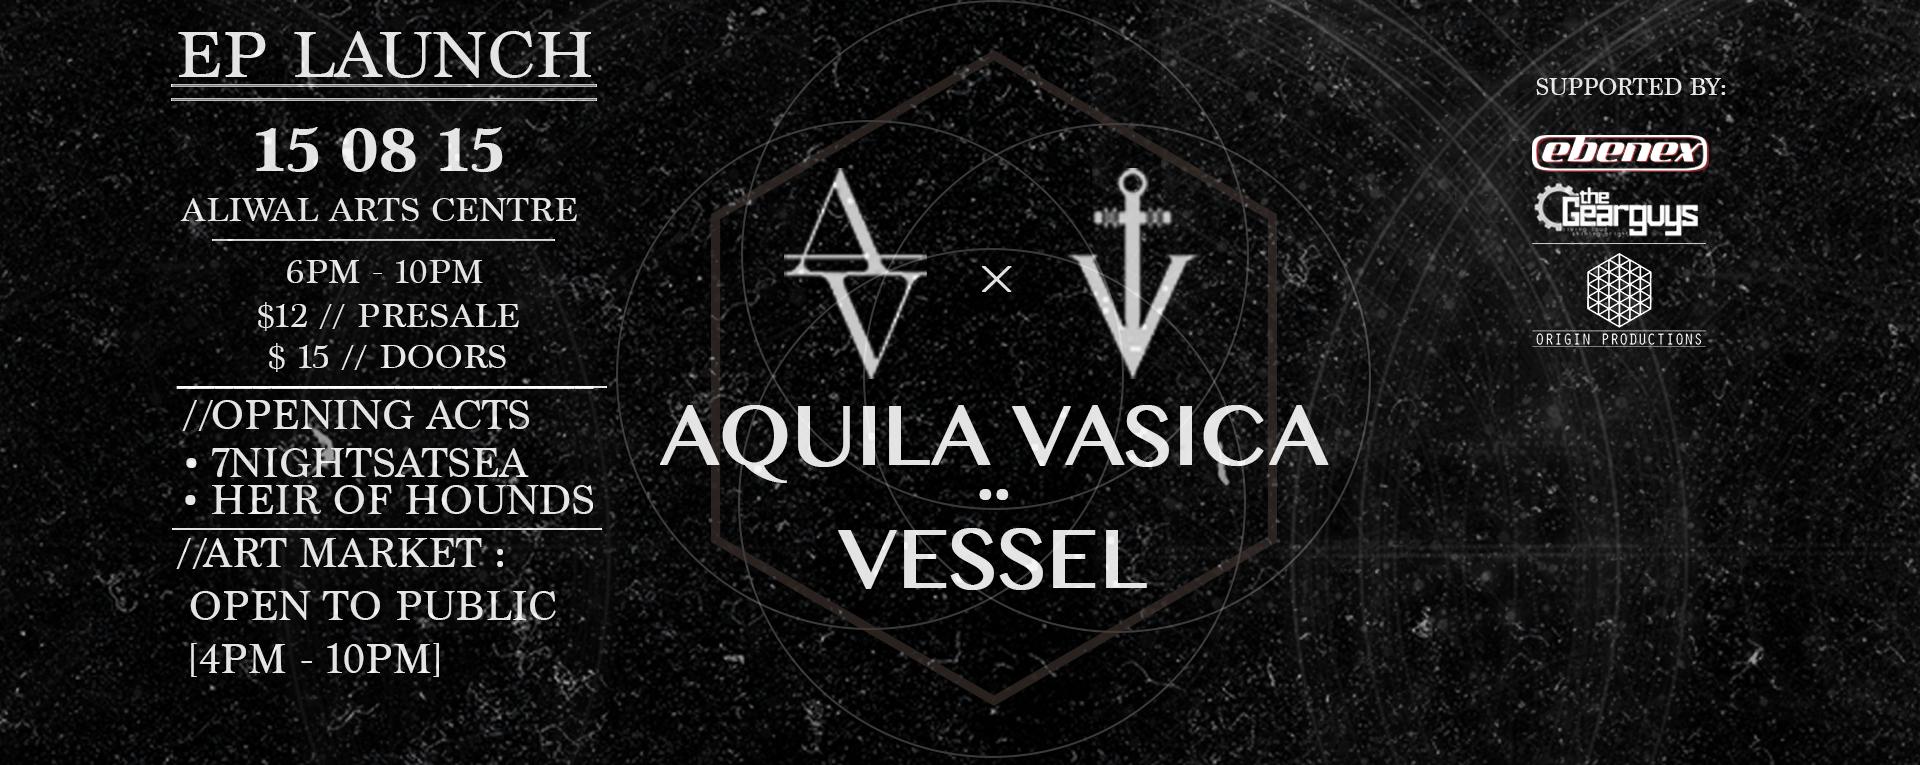 EP LAUNCH: AQUILA VASICA x VESSEL